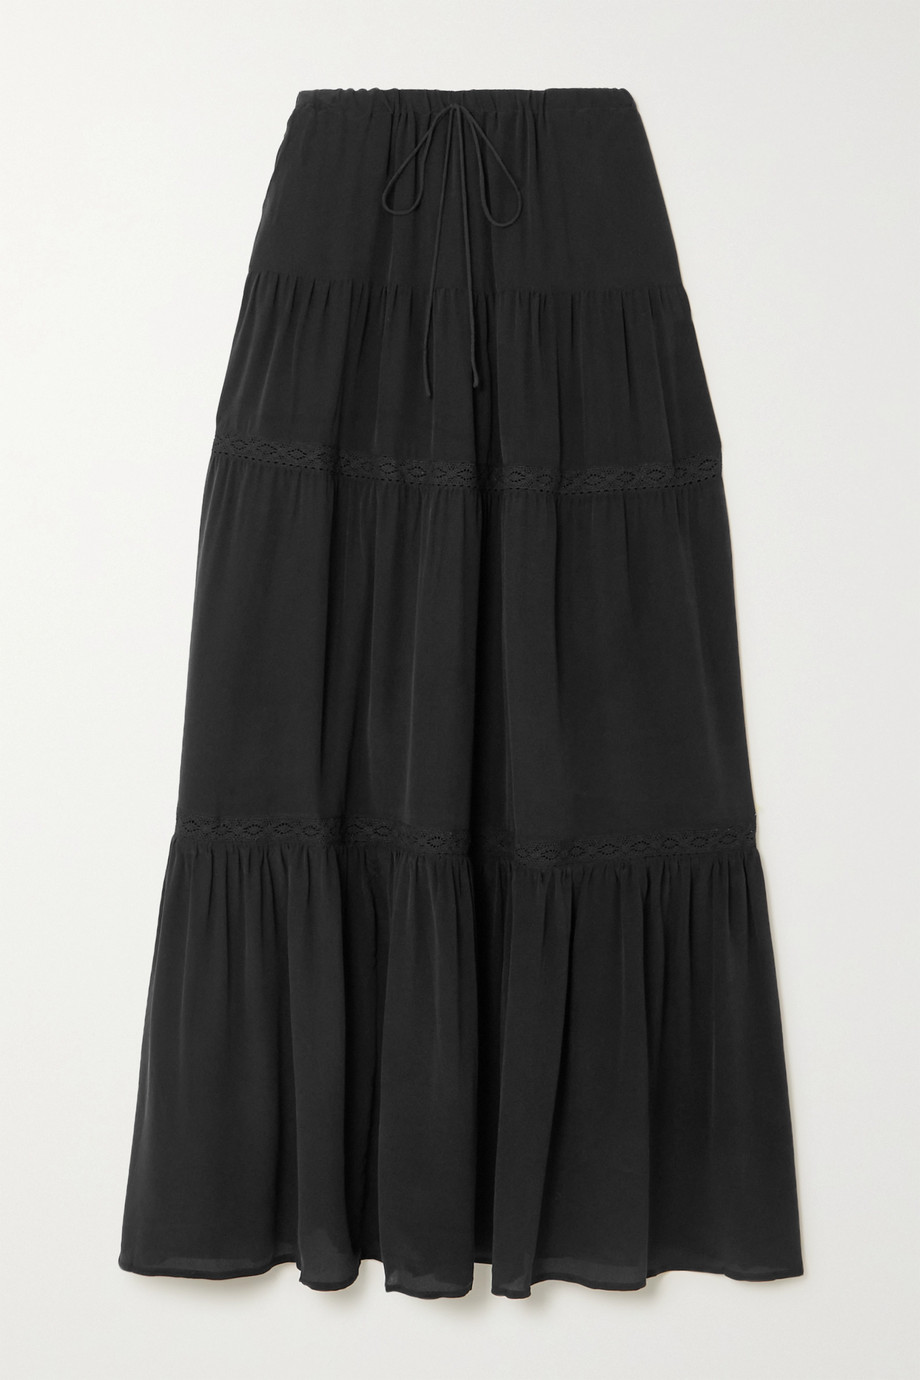 Joslin + NET SUSTAIN Adalyia crocheted lace-trimmed silk crepe de chine maxi skirt